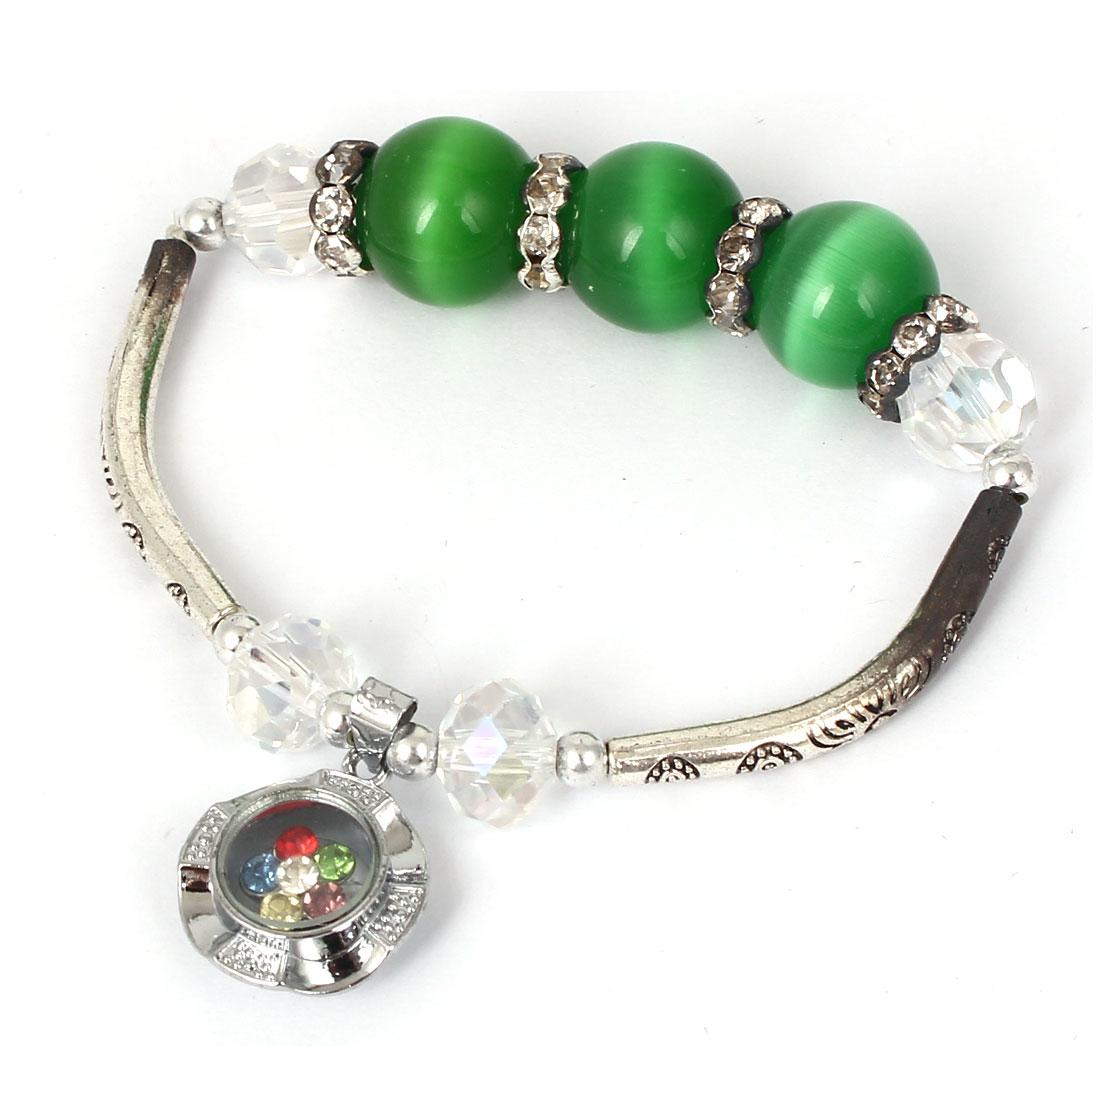 Women Faux Crystal Decor Cat Eye Round Bead Stretchy Bangle Bracelet Dark Green